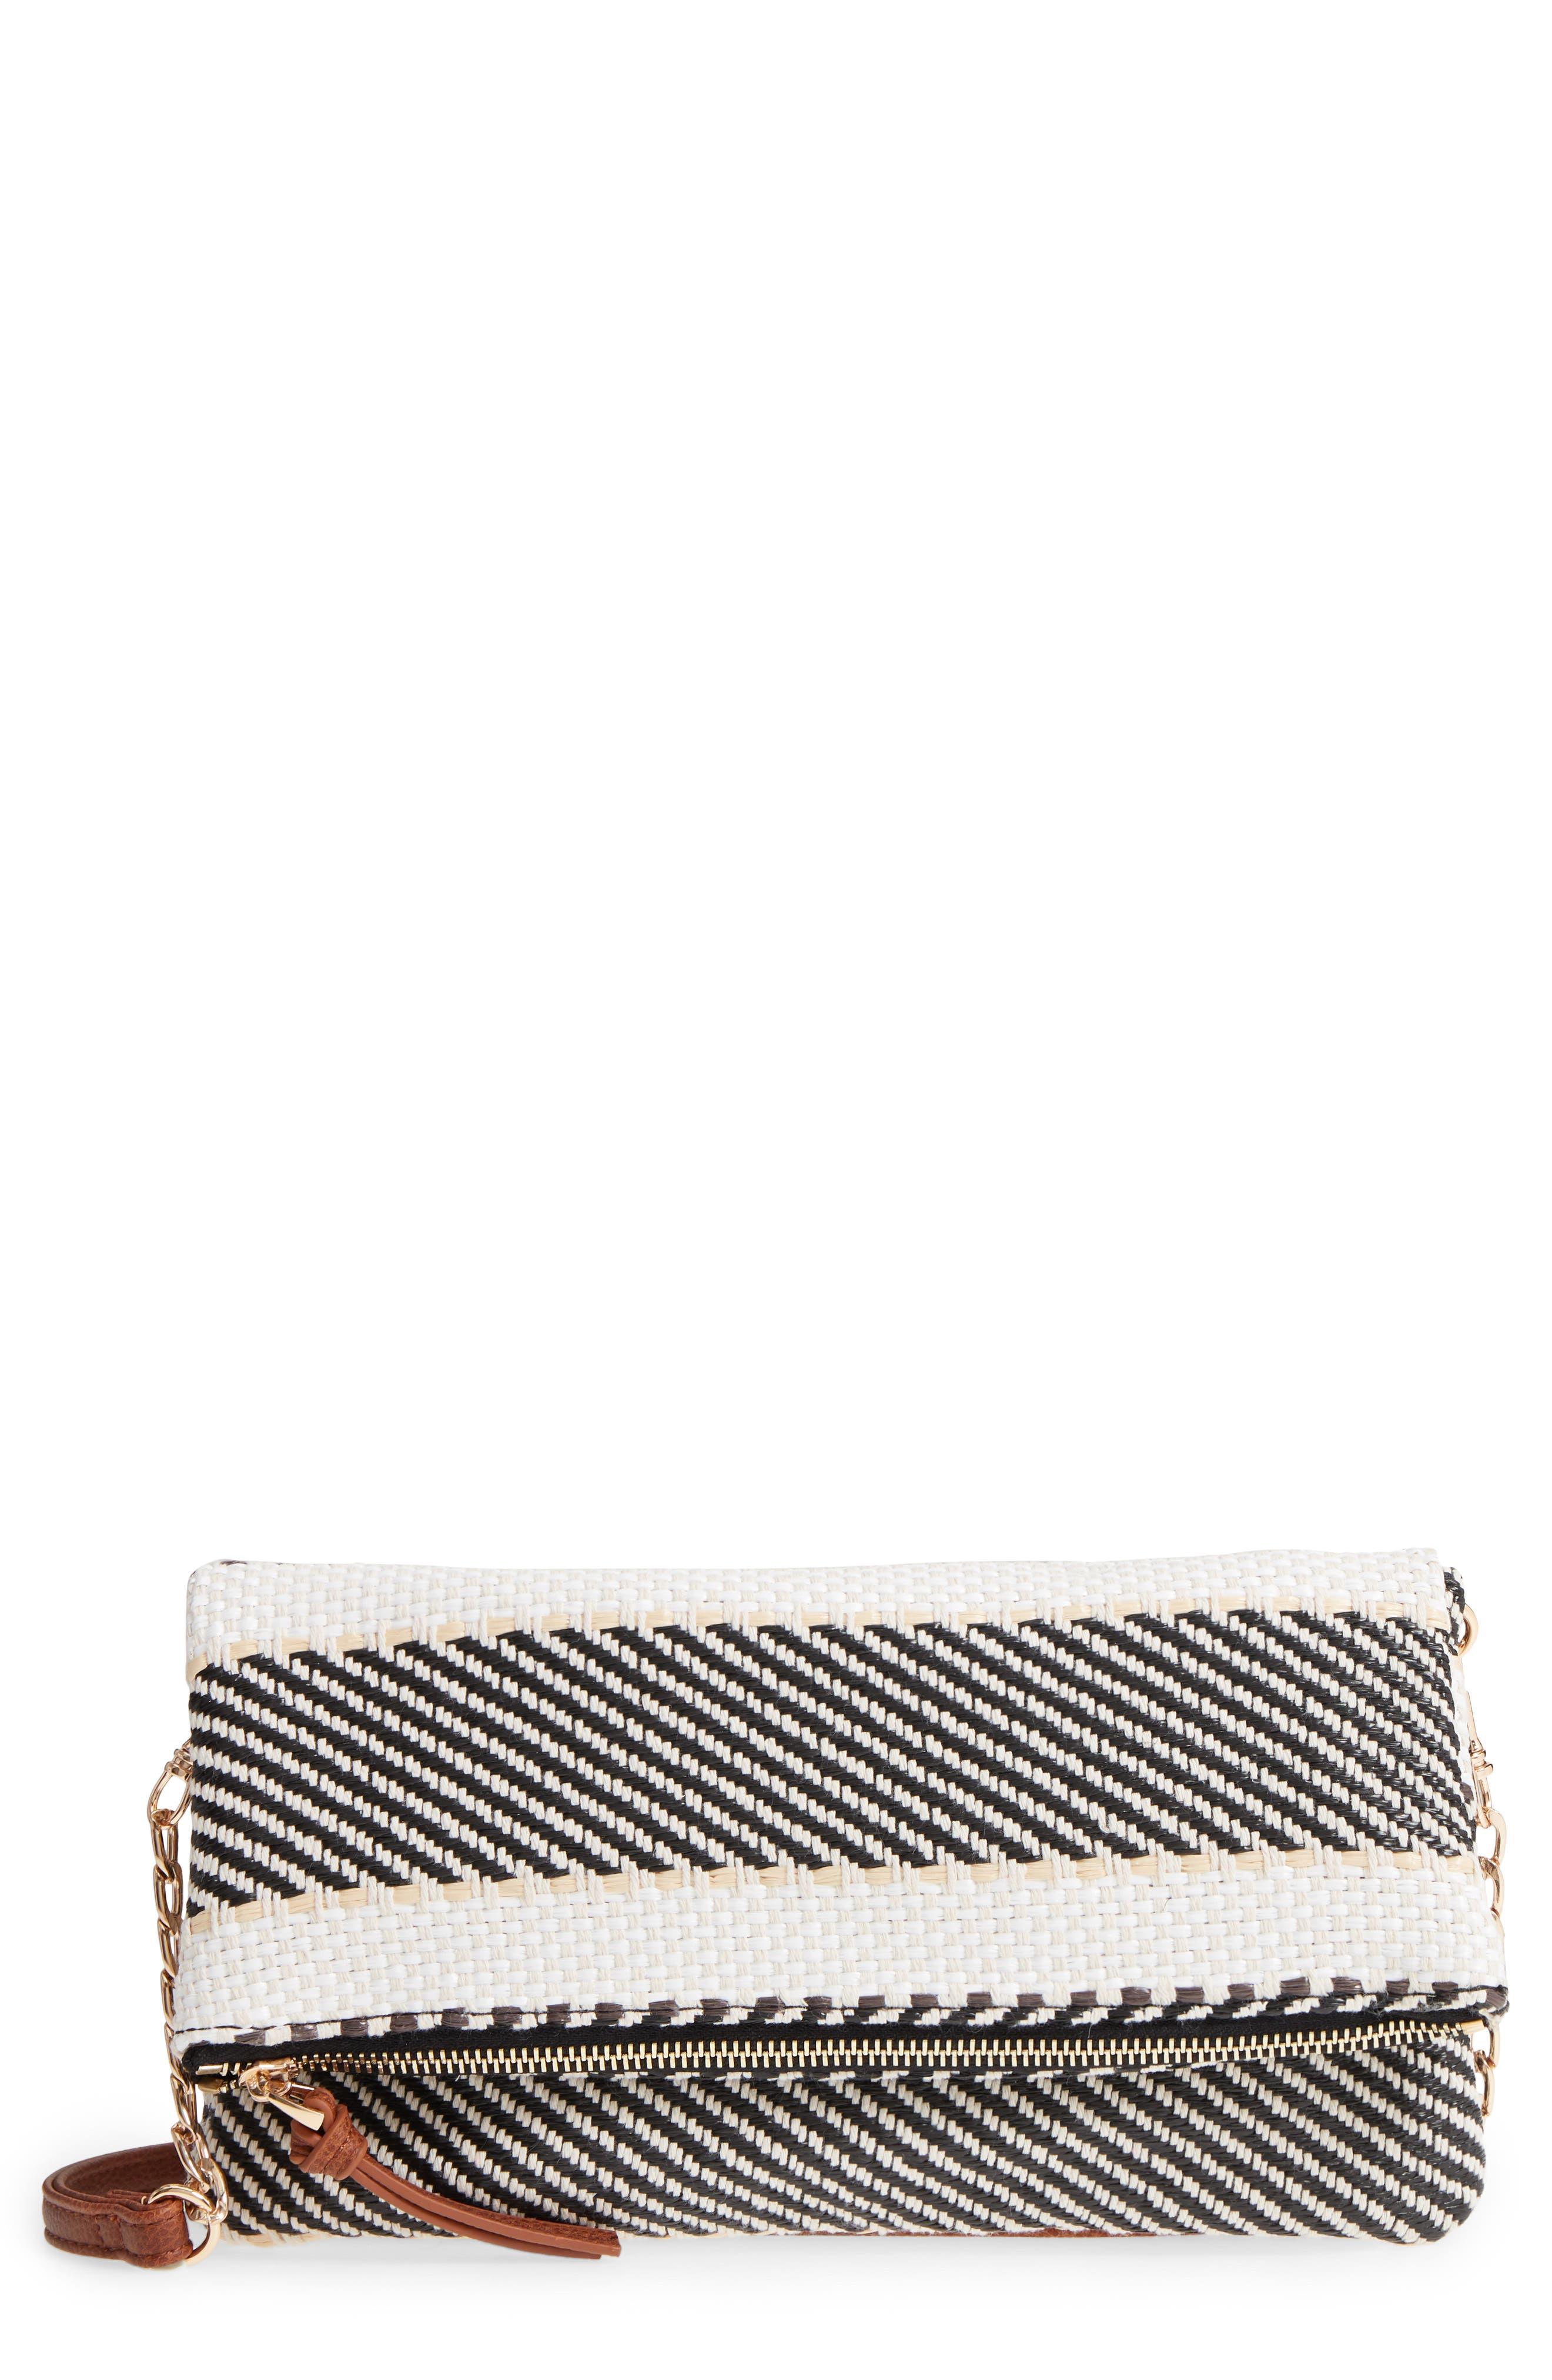 Medina Fabric Foldover Clutch,                             Main thumbnail 1, color,                             Black/ Cream Combo